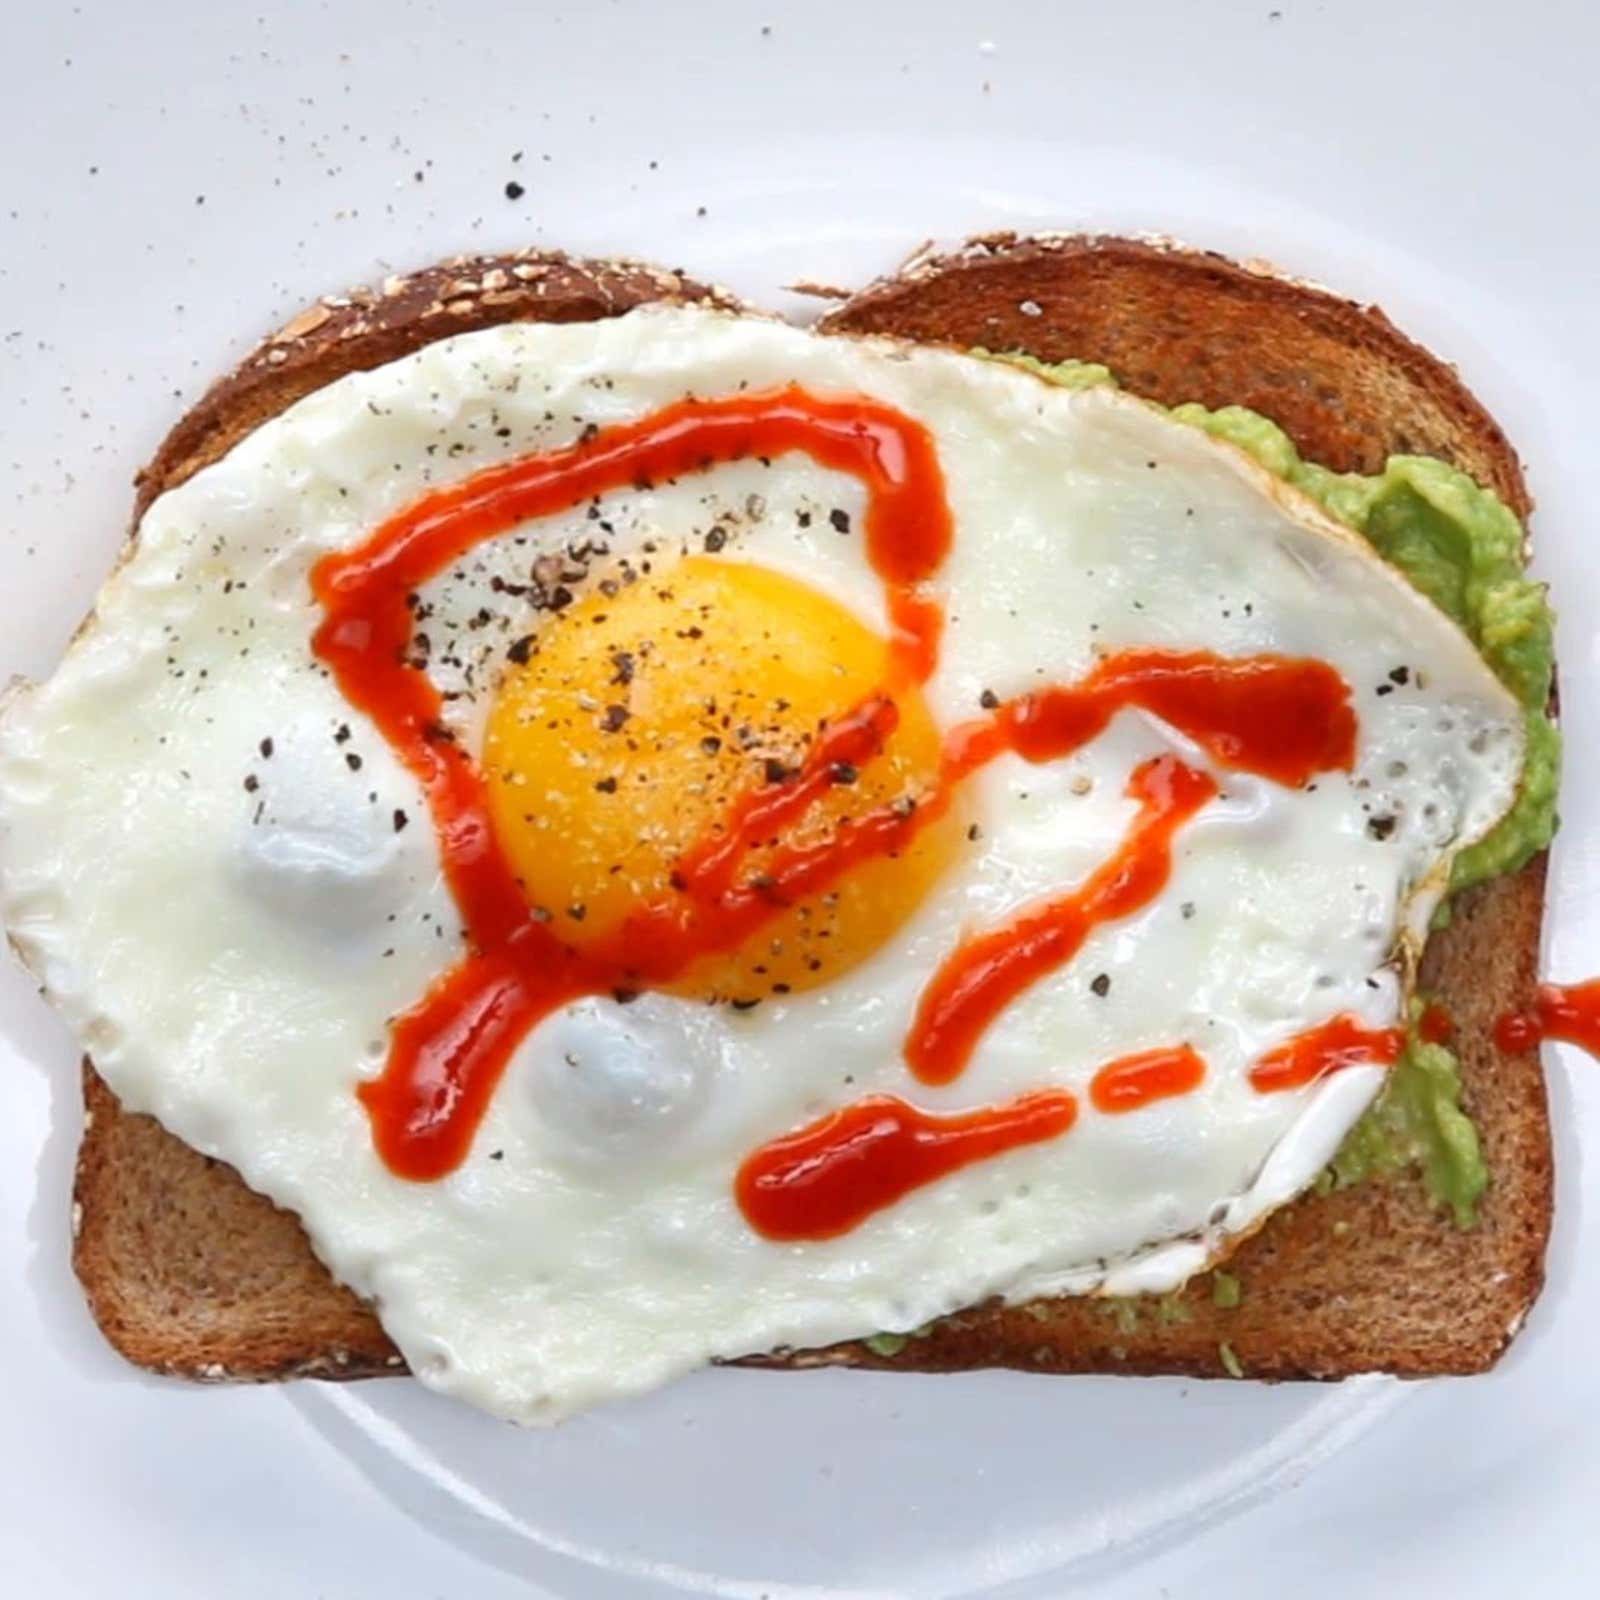 Spicy Fried Egg Avocado Toast